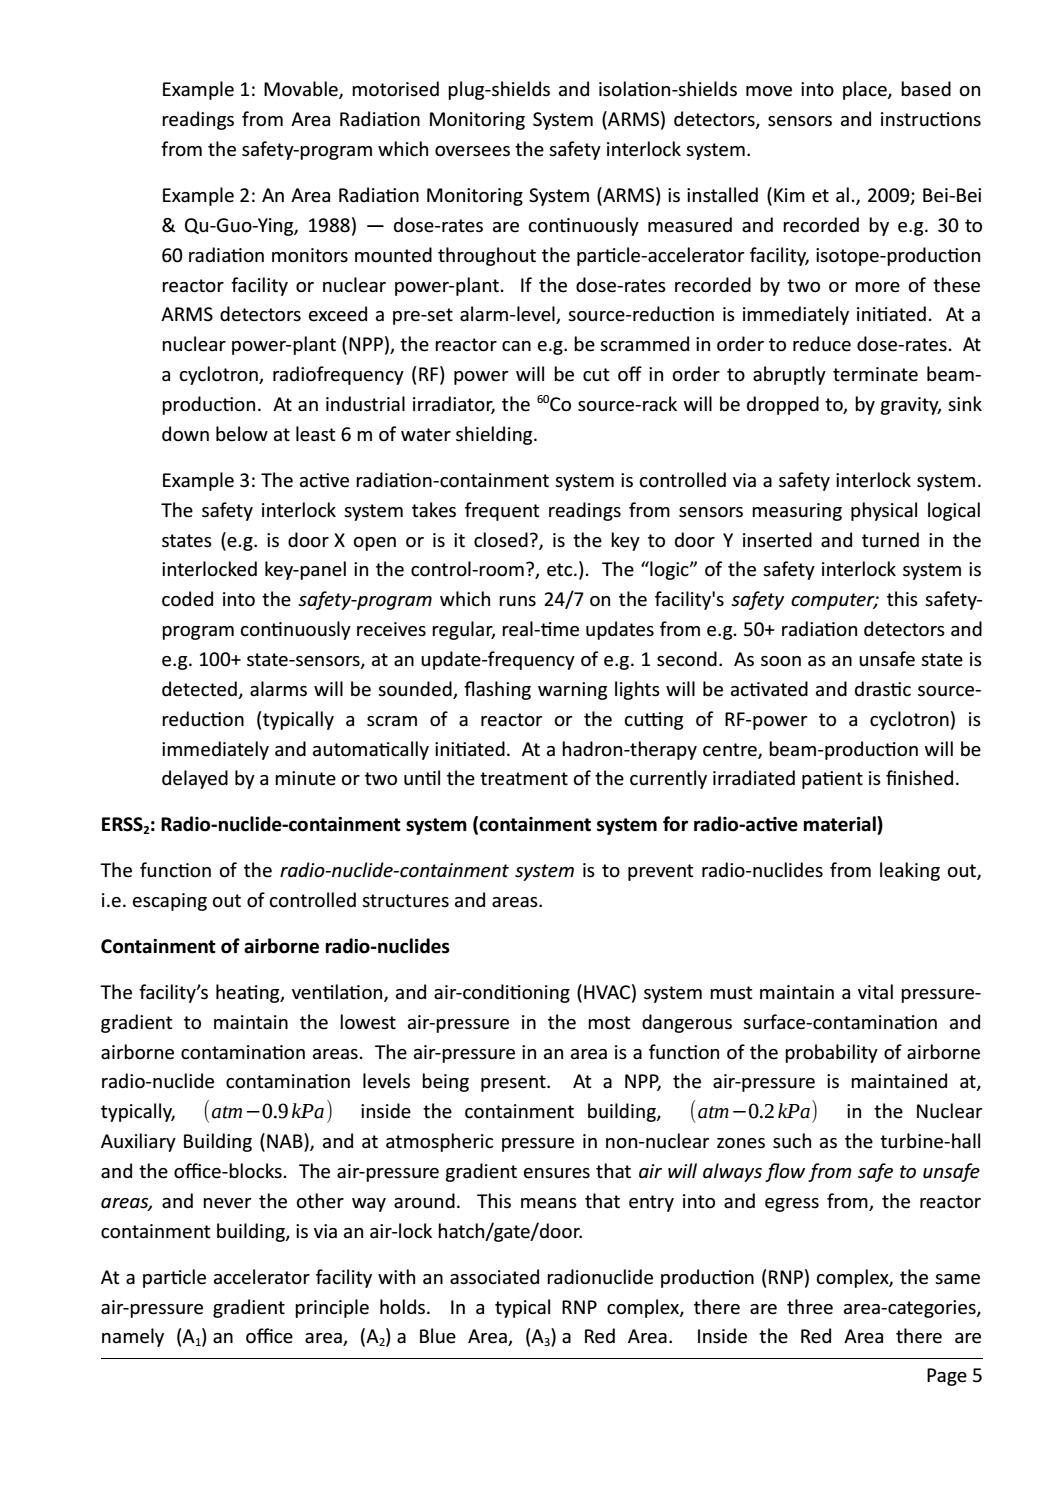 RADIOACTIVE WASTE: COMPUTATIONAL CHARACTERISATION and SHIELDING page 30